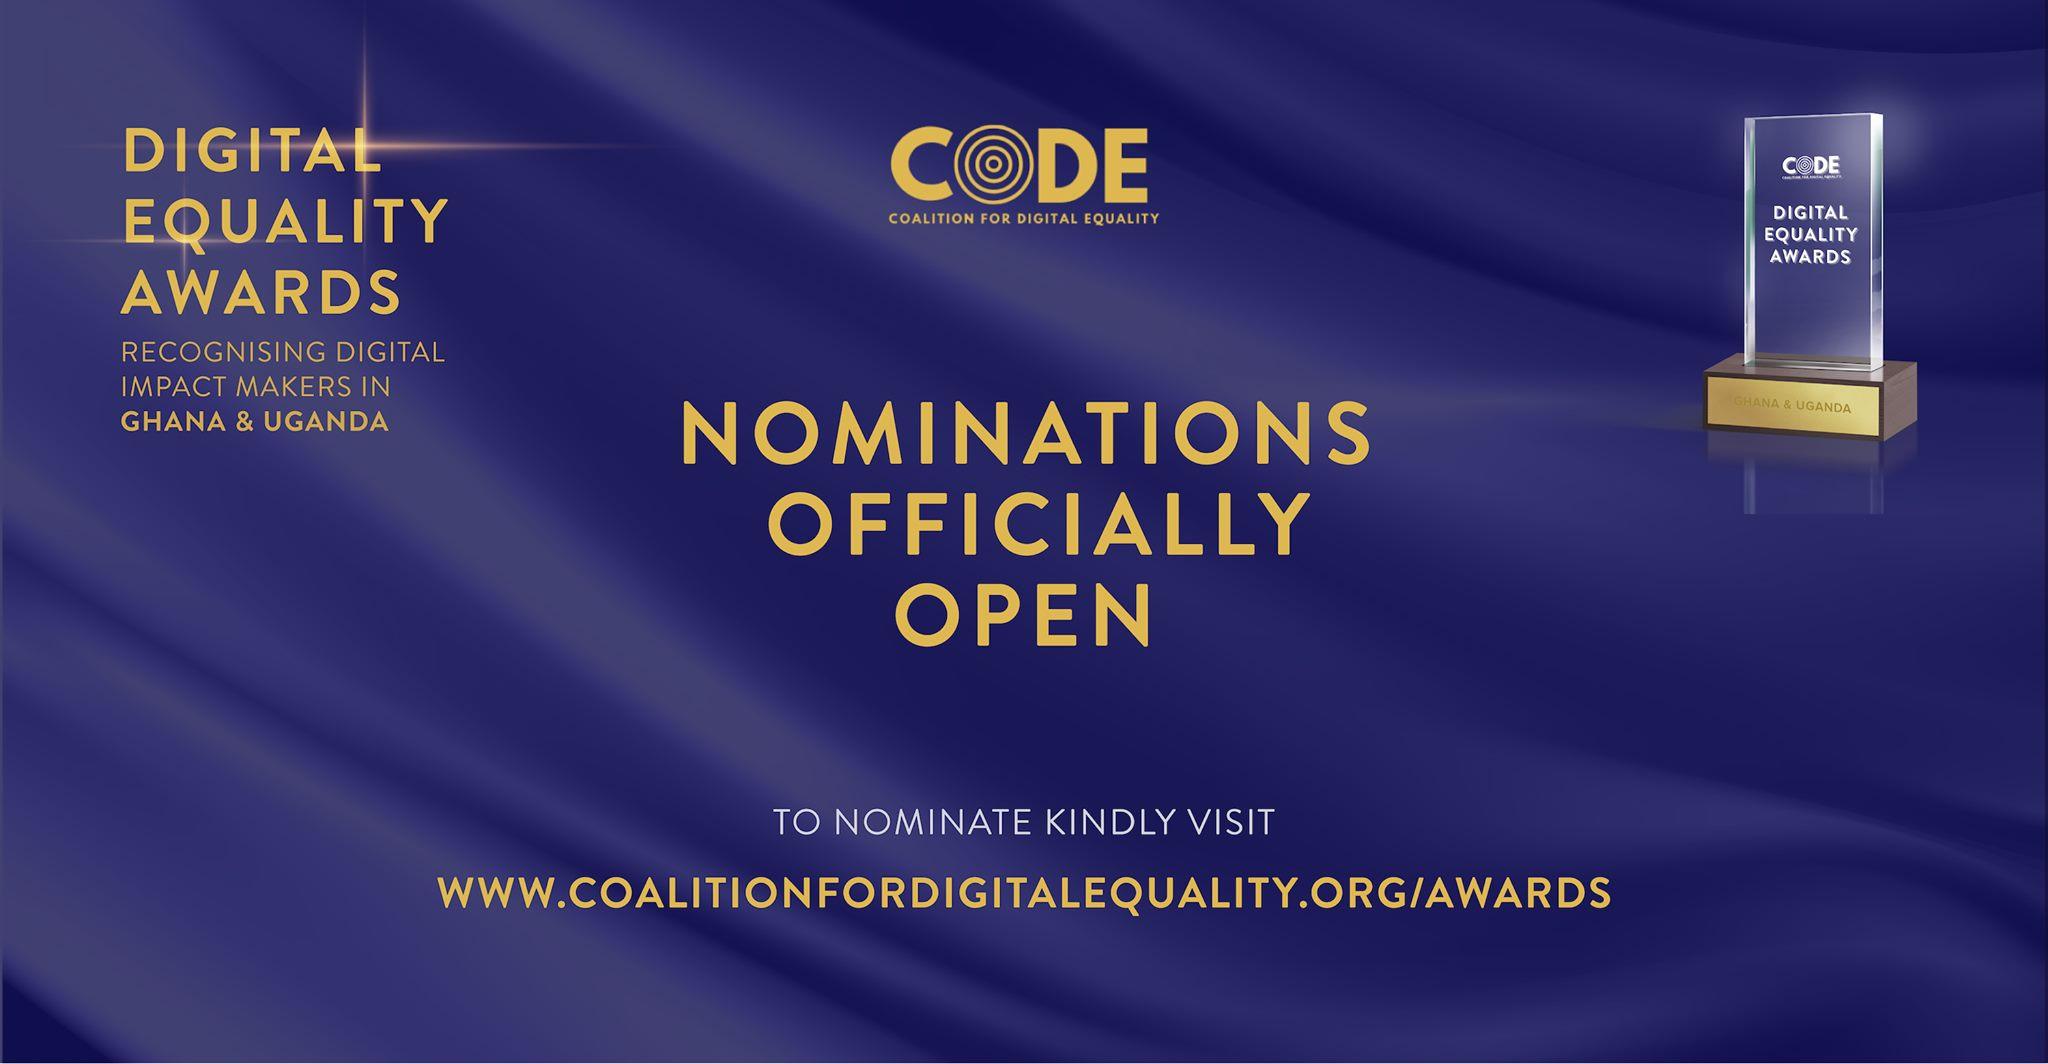 Digital Equality Awards